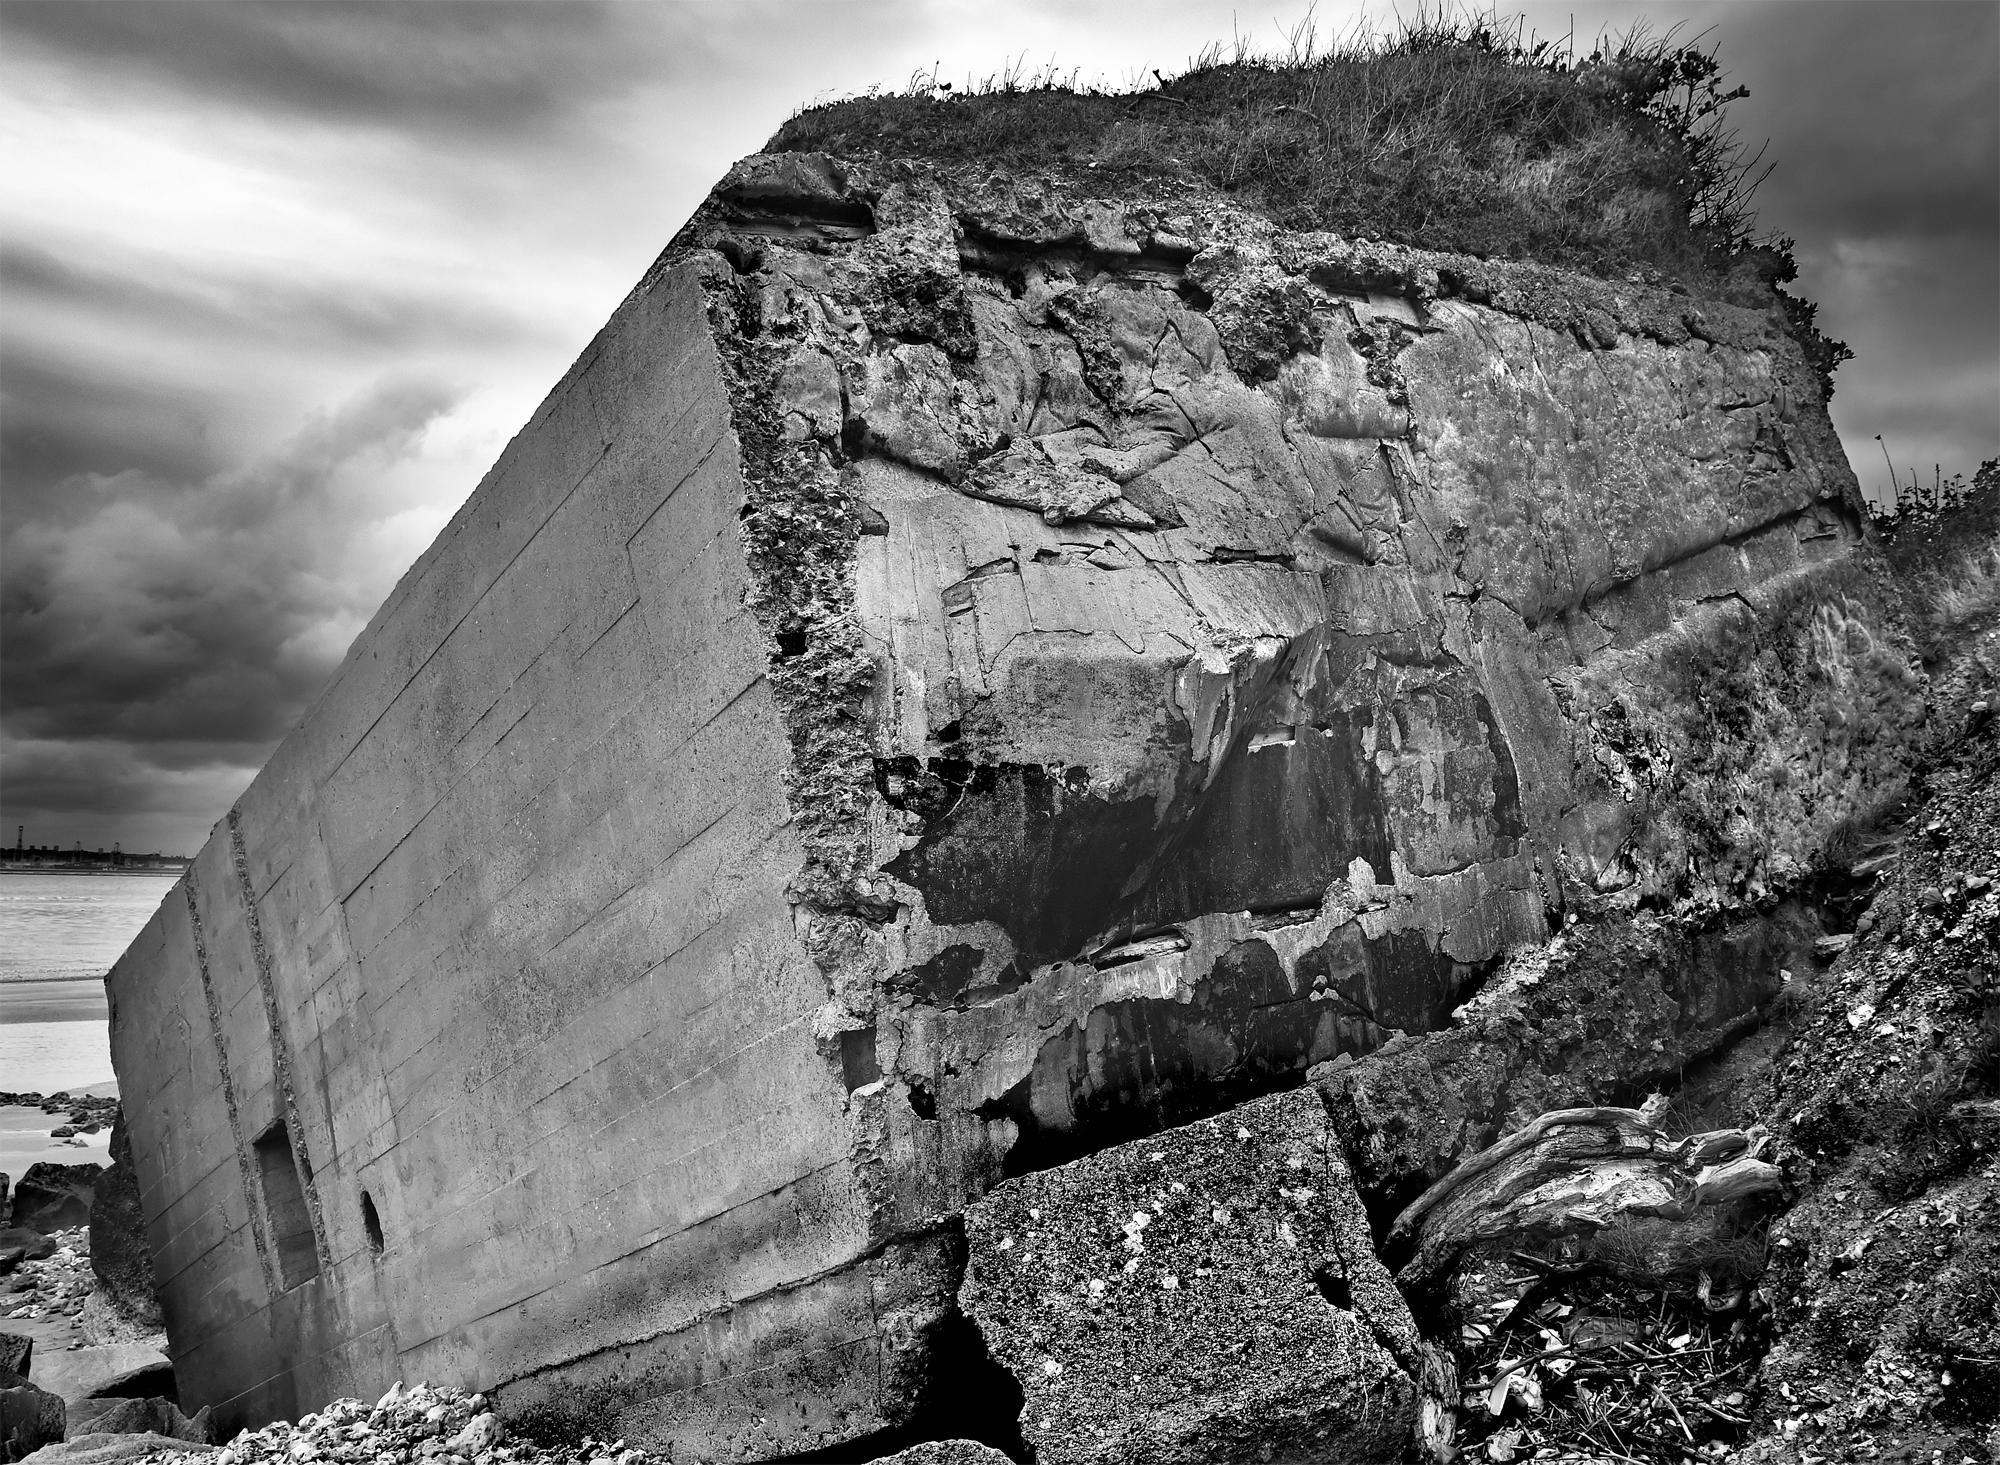 chute-de-beton-Michel-Trehet